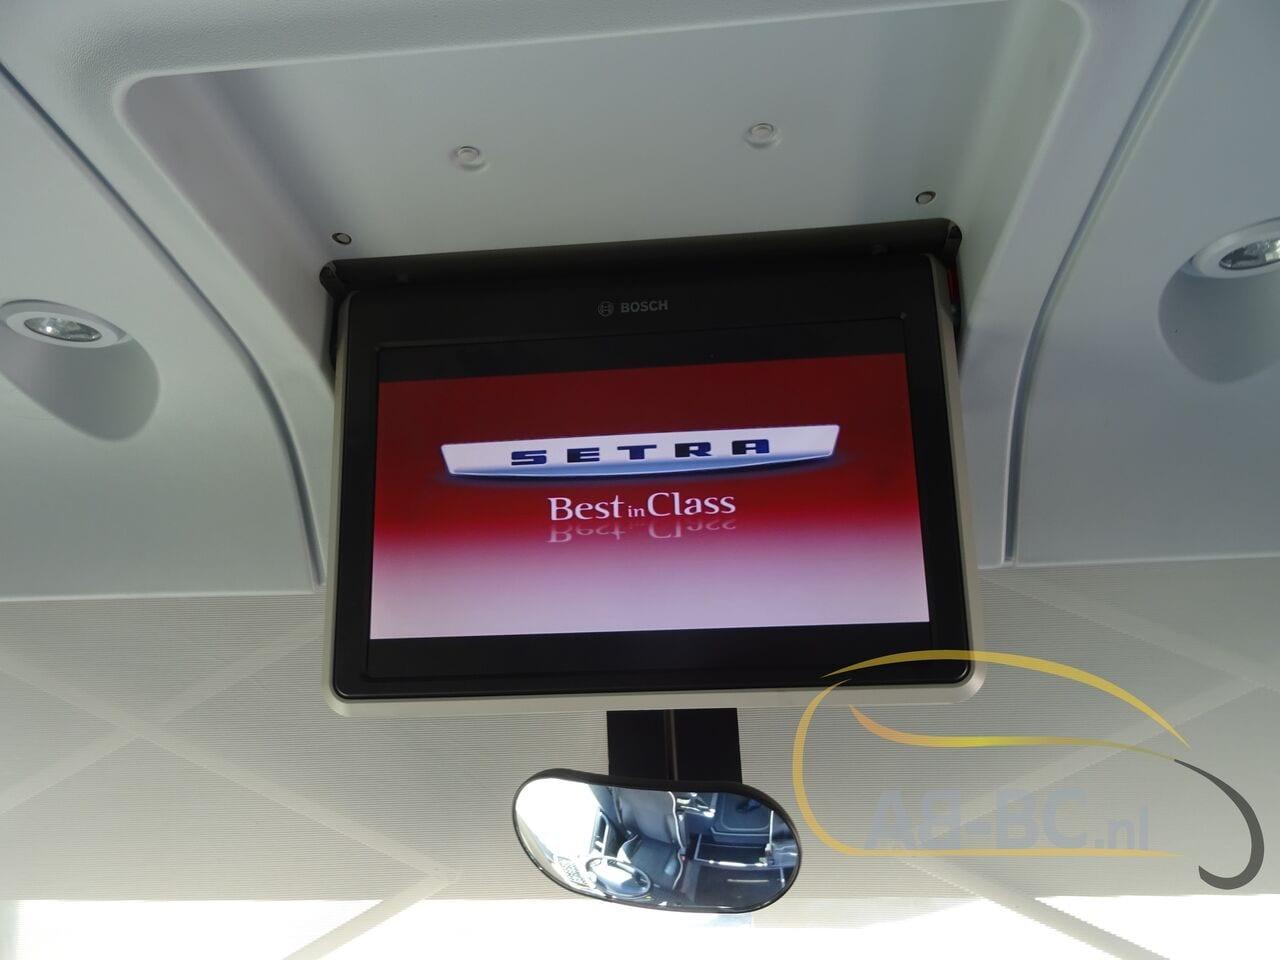 coach-busSETRA-S415-GT-HD-FINAL-EDITION-51-SEATS-LIFTBUS---1620382042716705133_big_41126e68c8648113ef7a8e3e38d1cc25--21050713010665719300